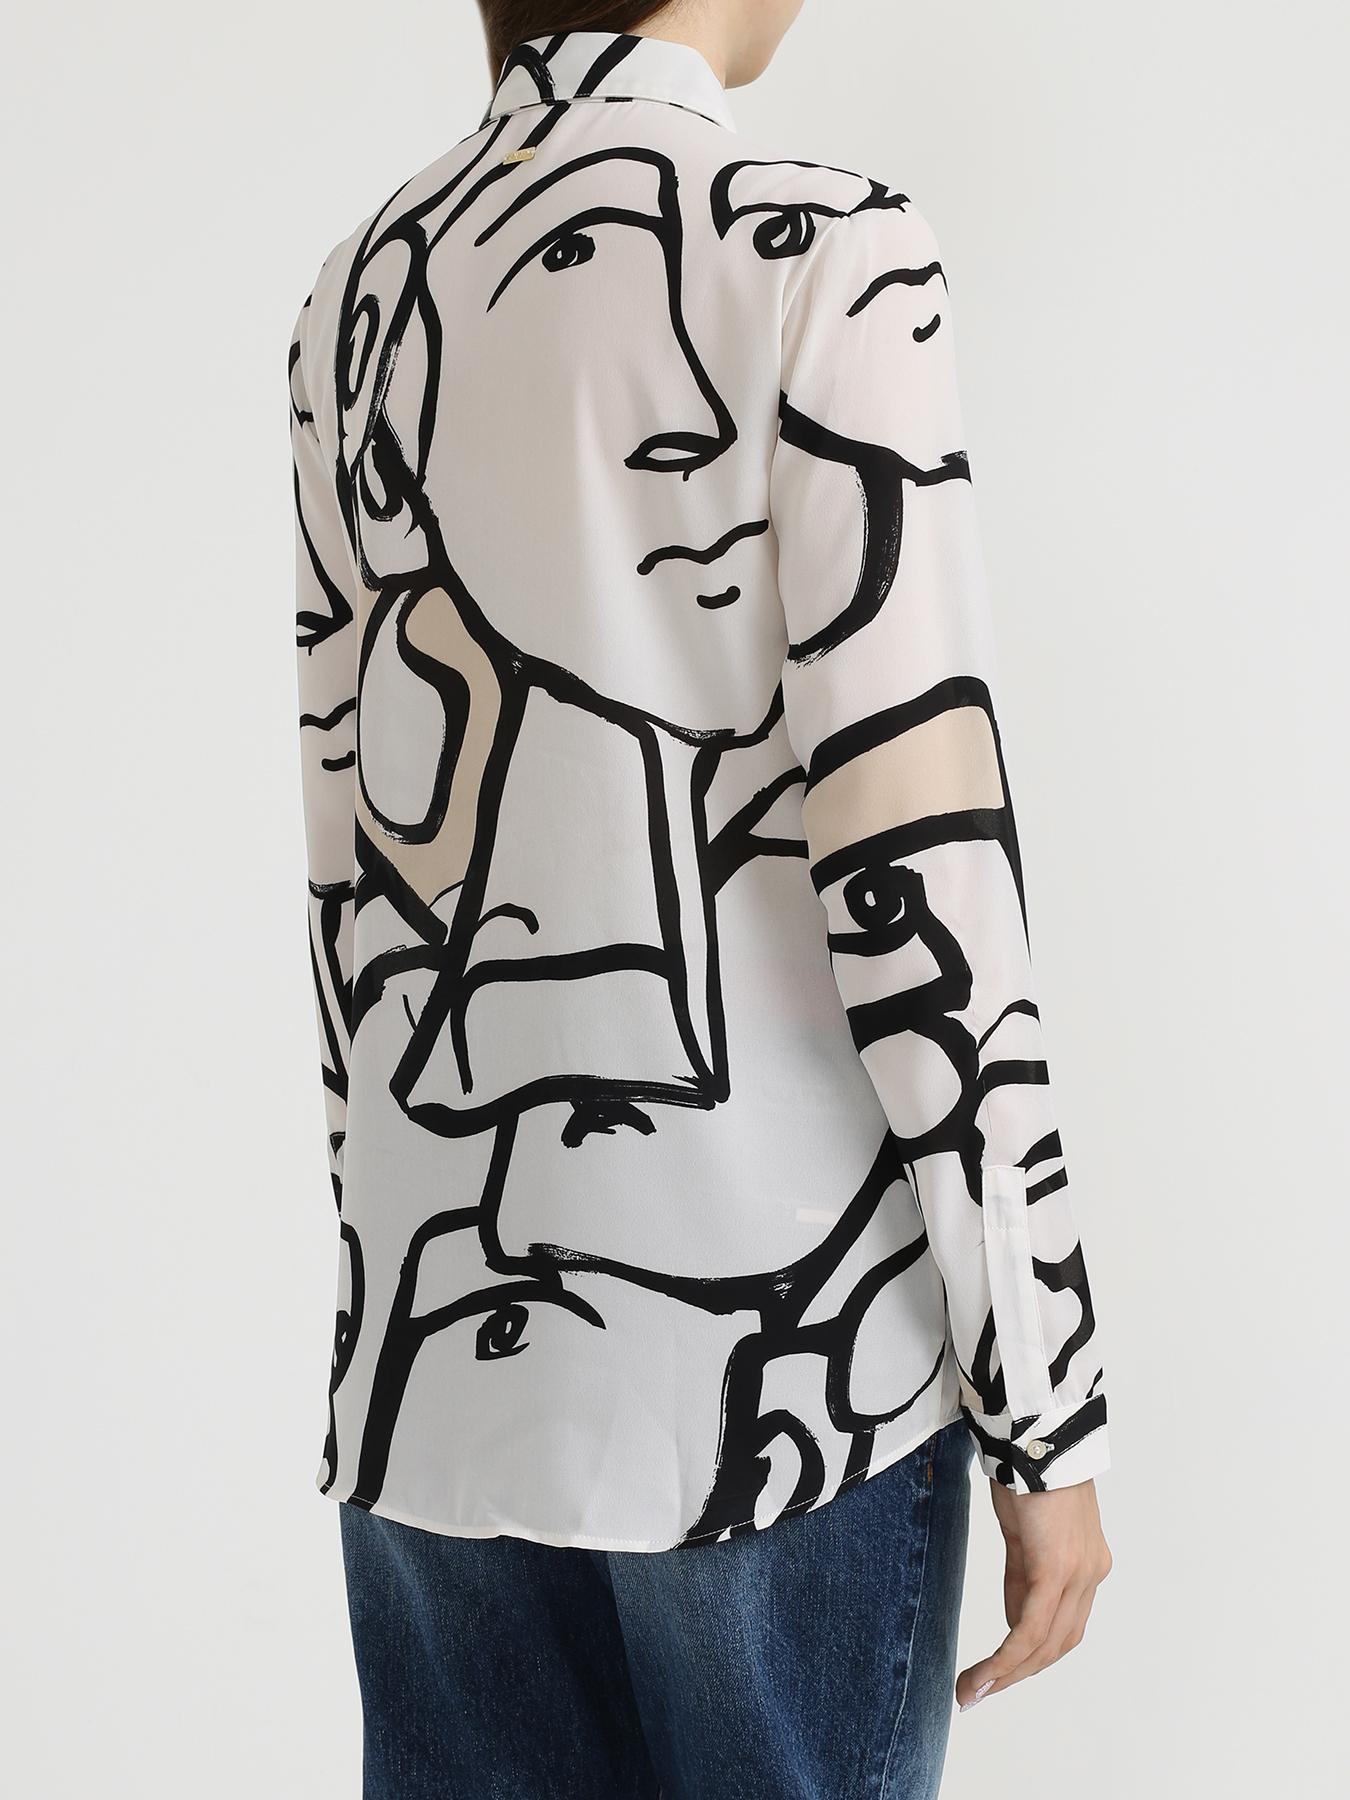 Armani Exchange Женская блузка с рисунками 353109-044 Фото 2